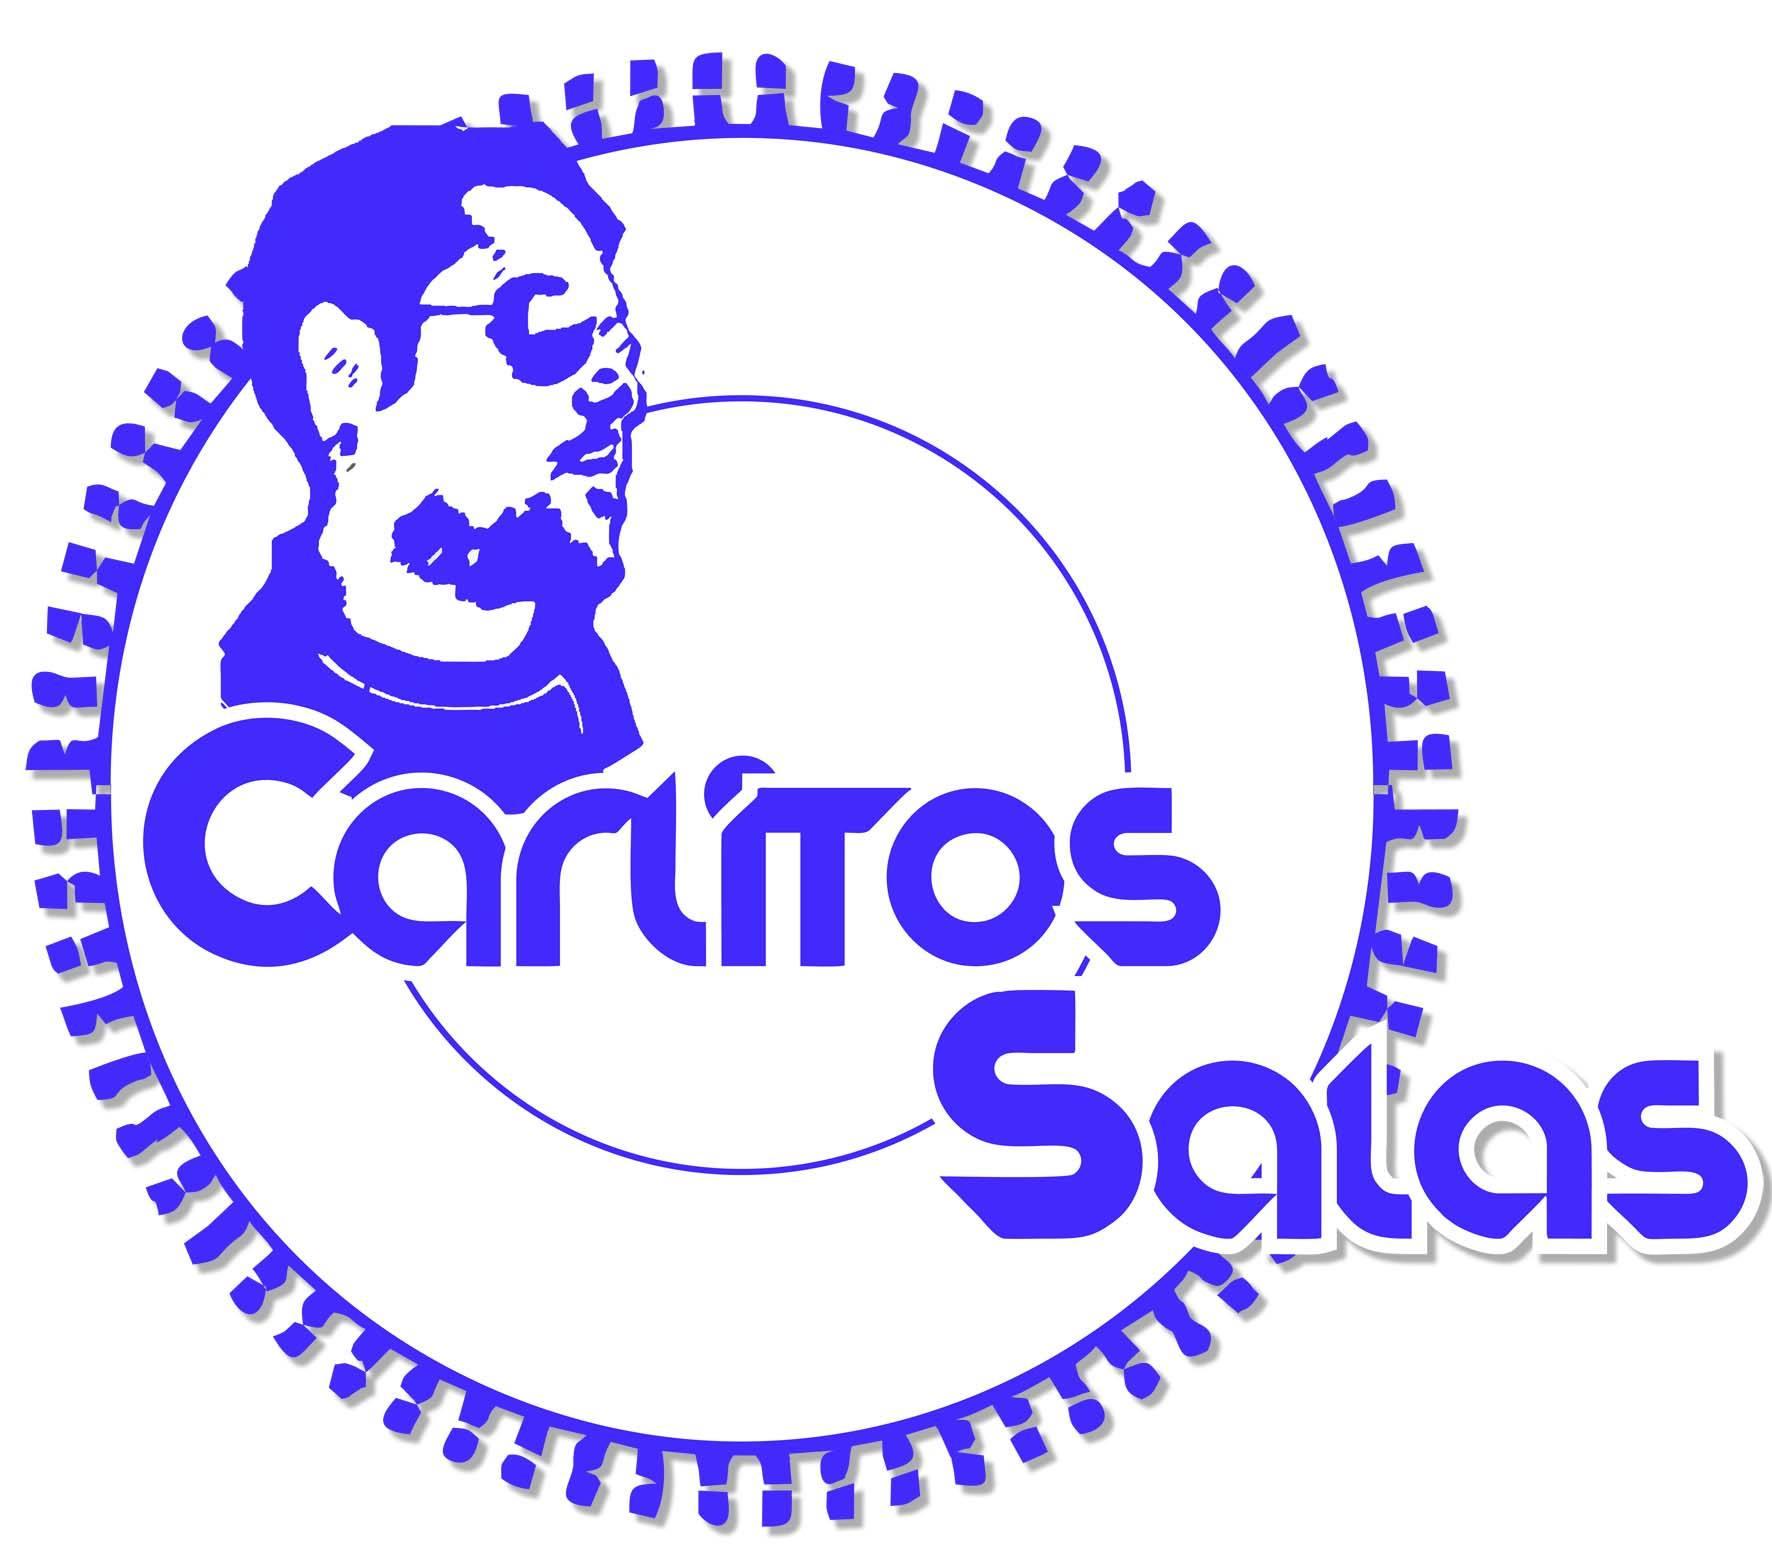 Carlitos Salas